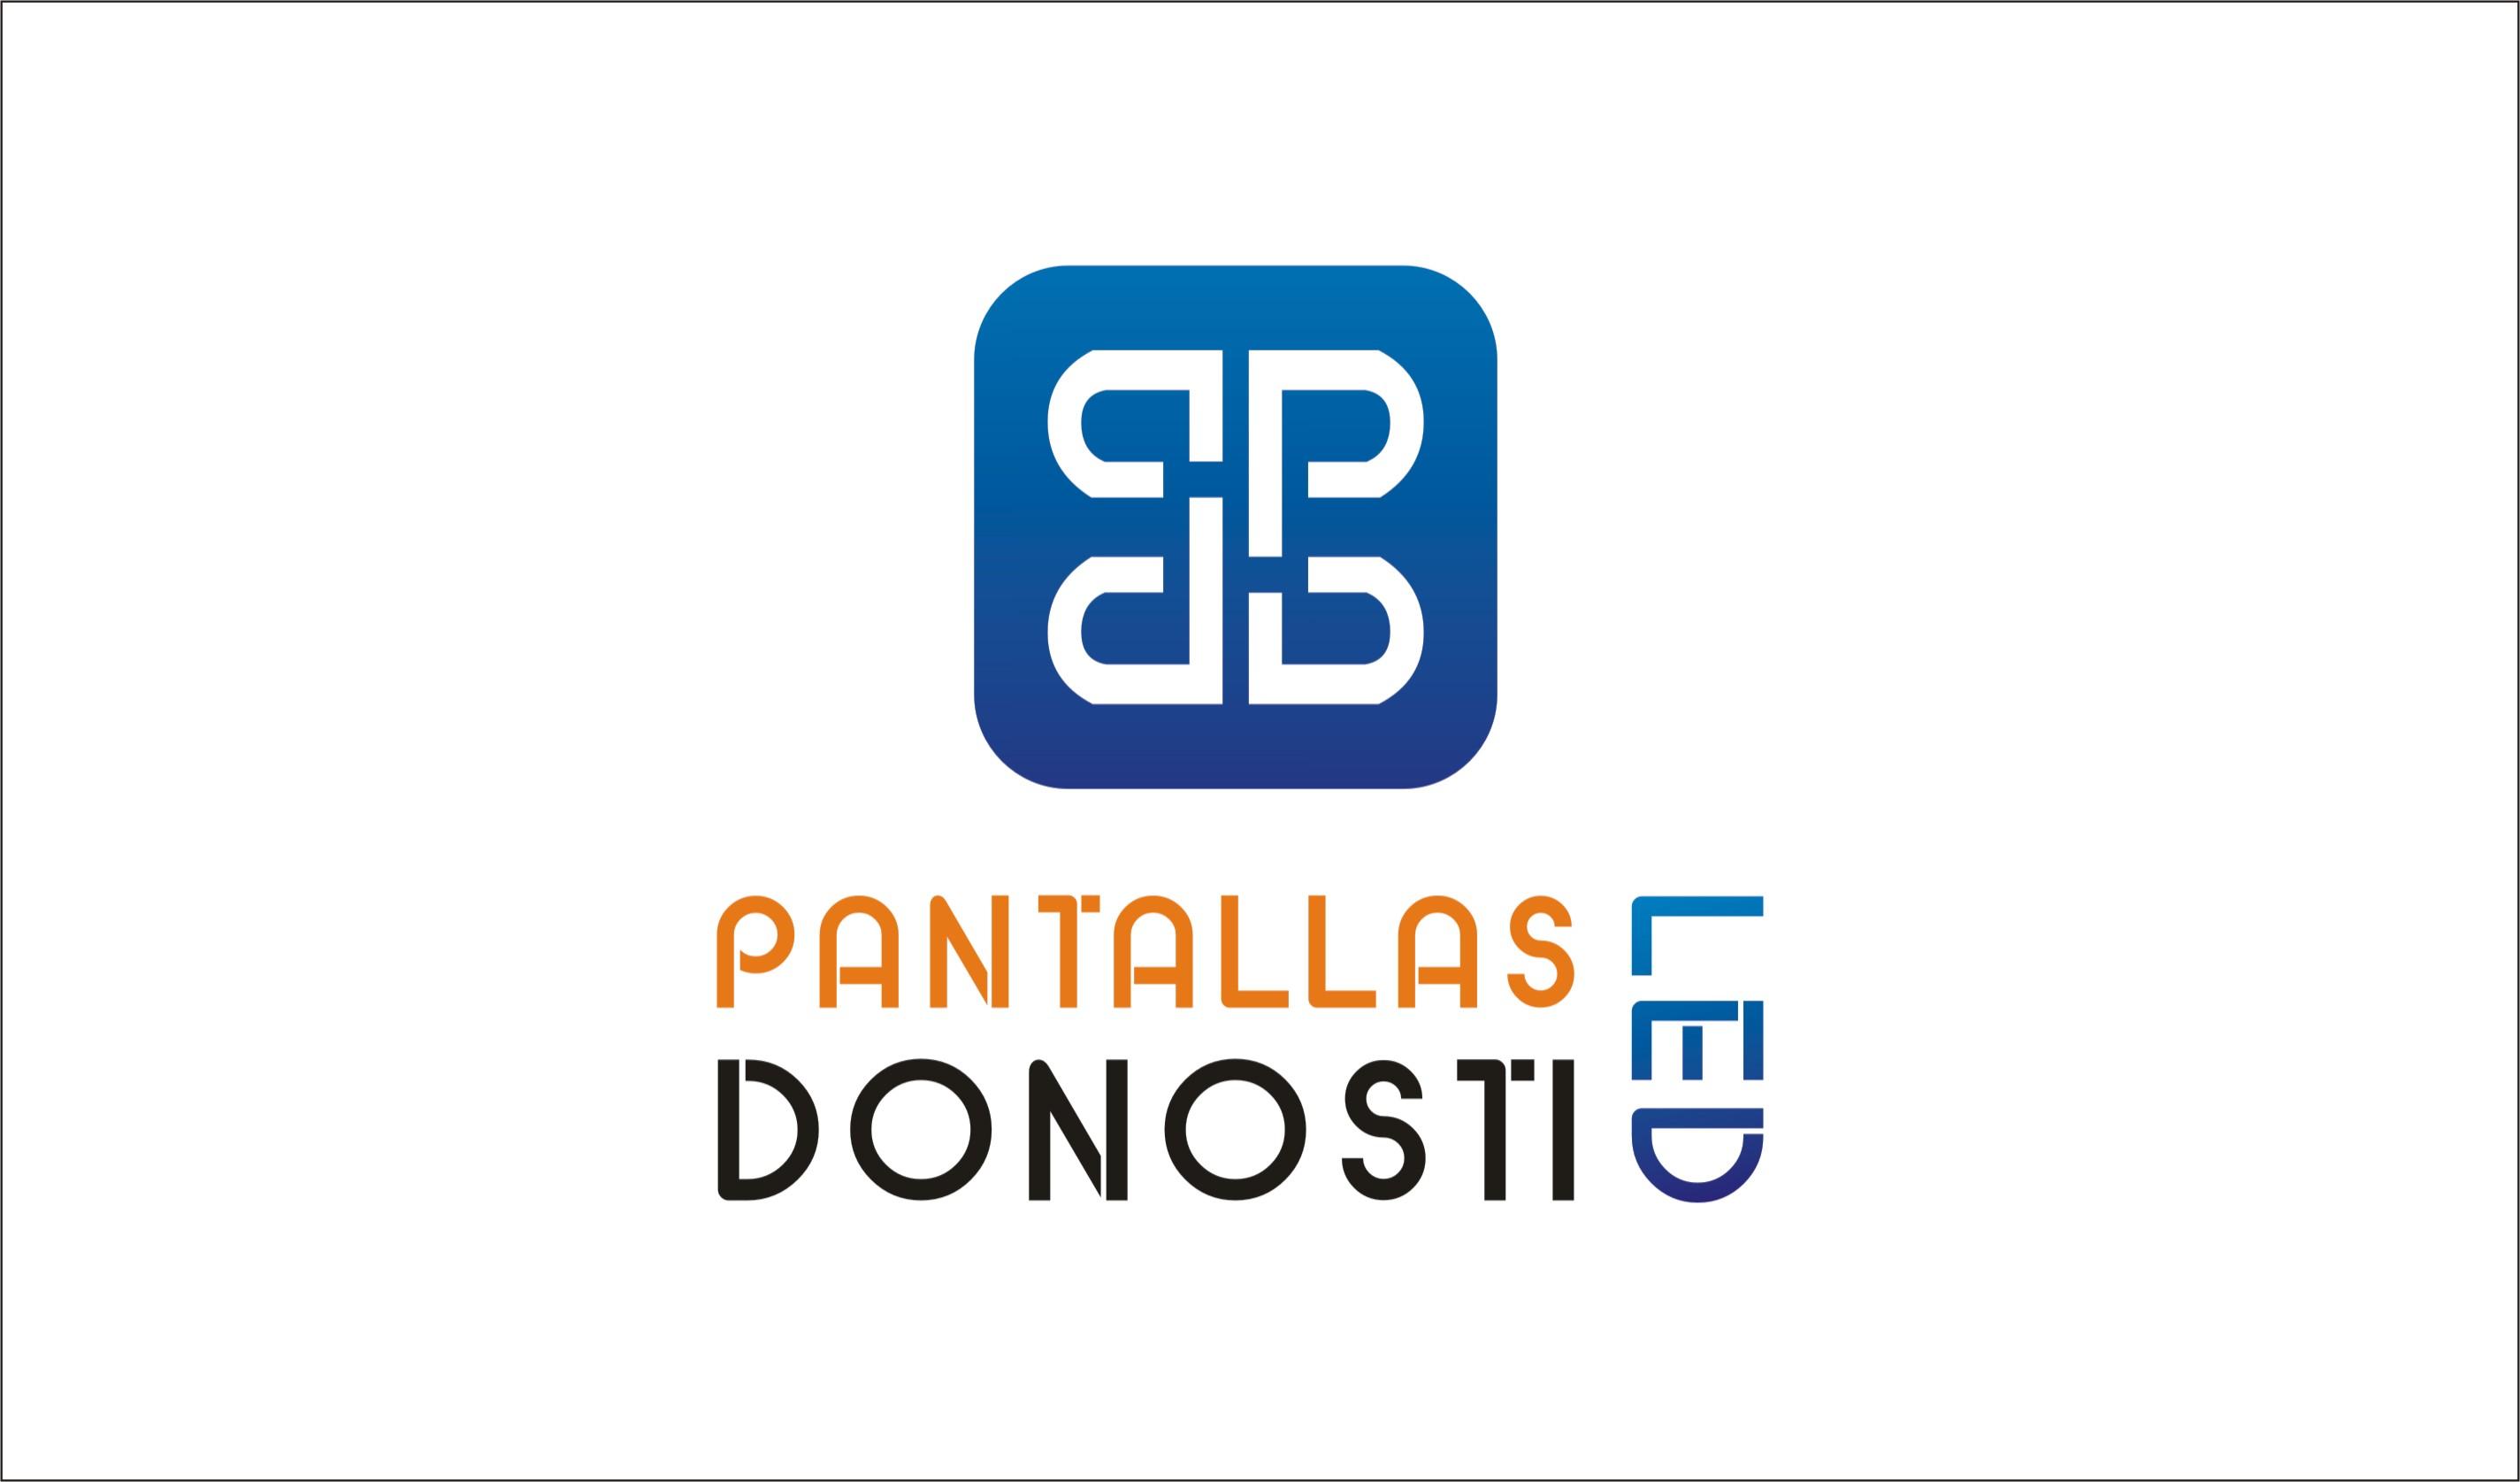 PANTALLAS LED DONOSTI